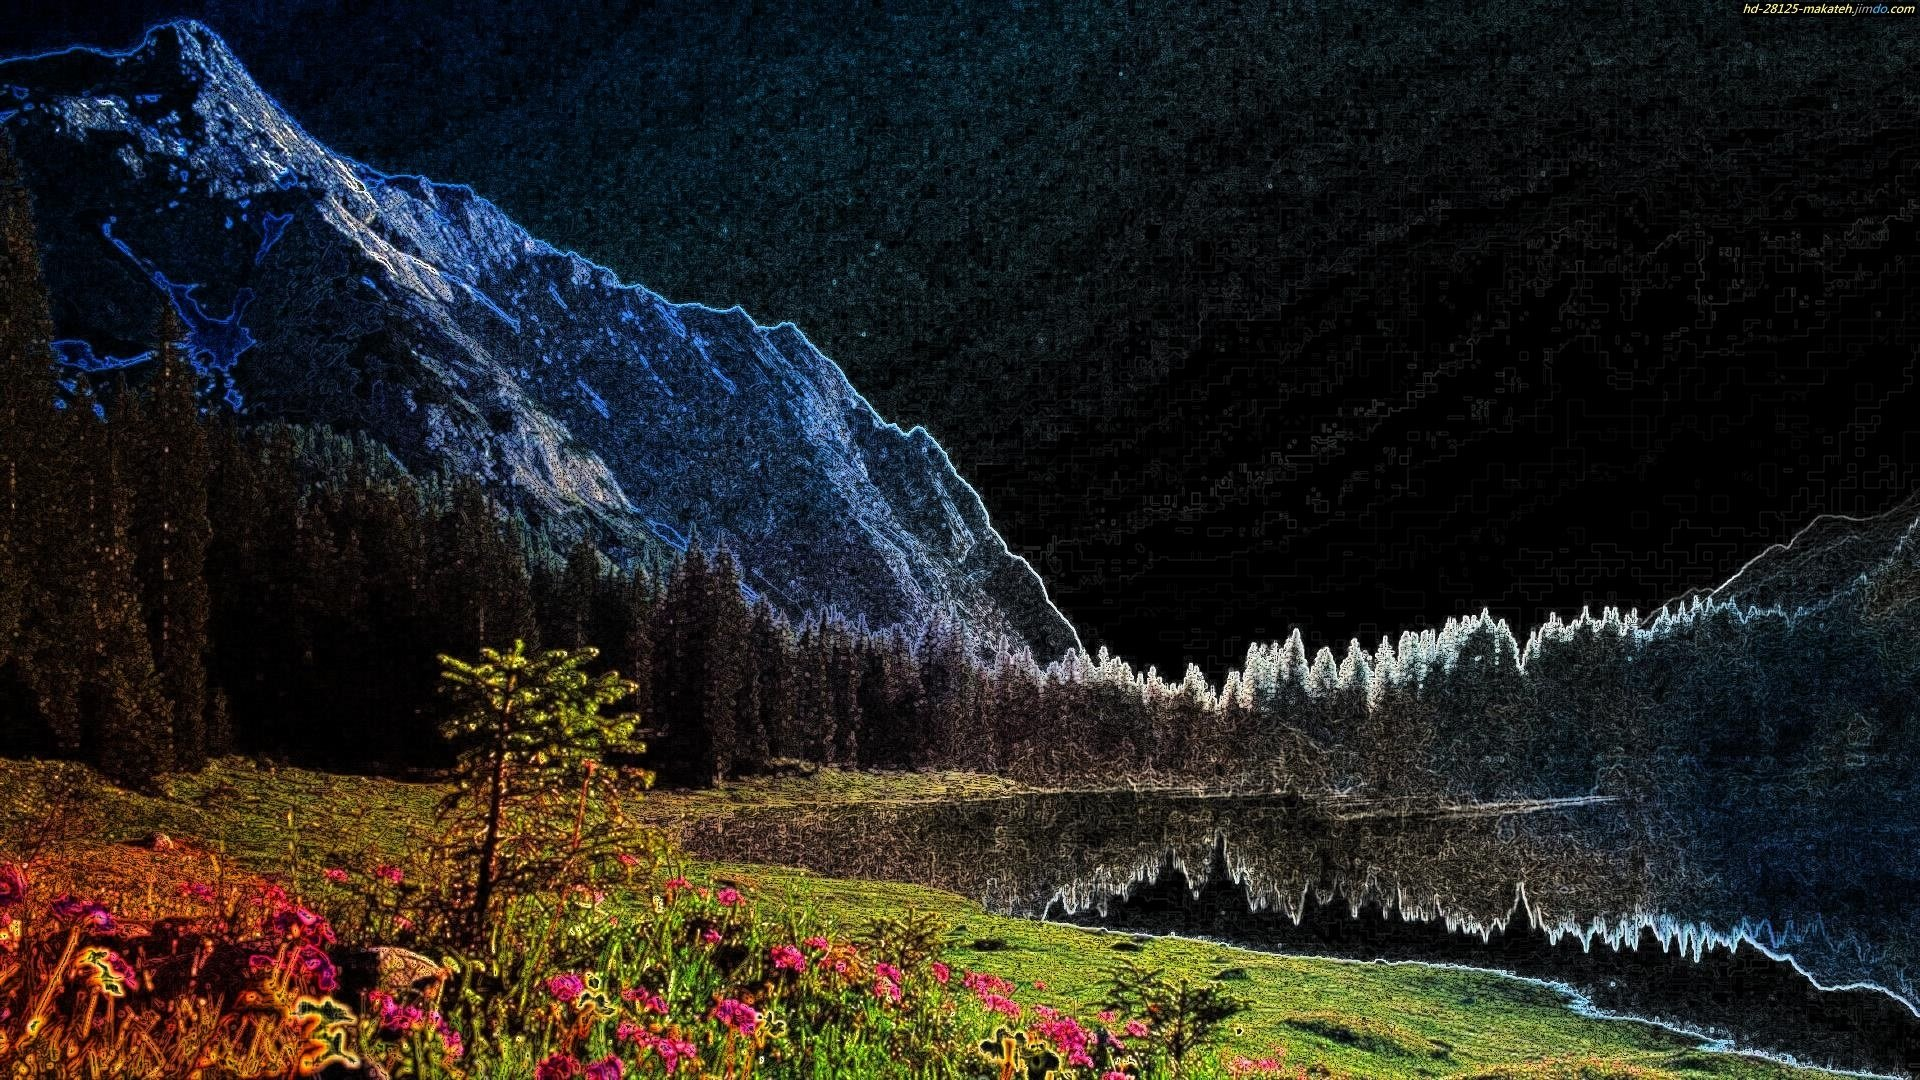 Landschaft 1 HD Wallpaper   Background Image   1920x1080 ...